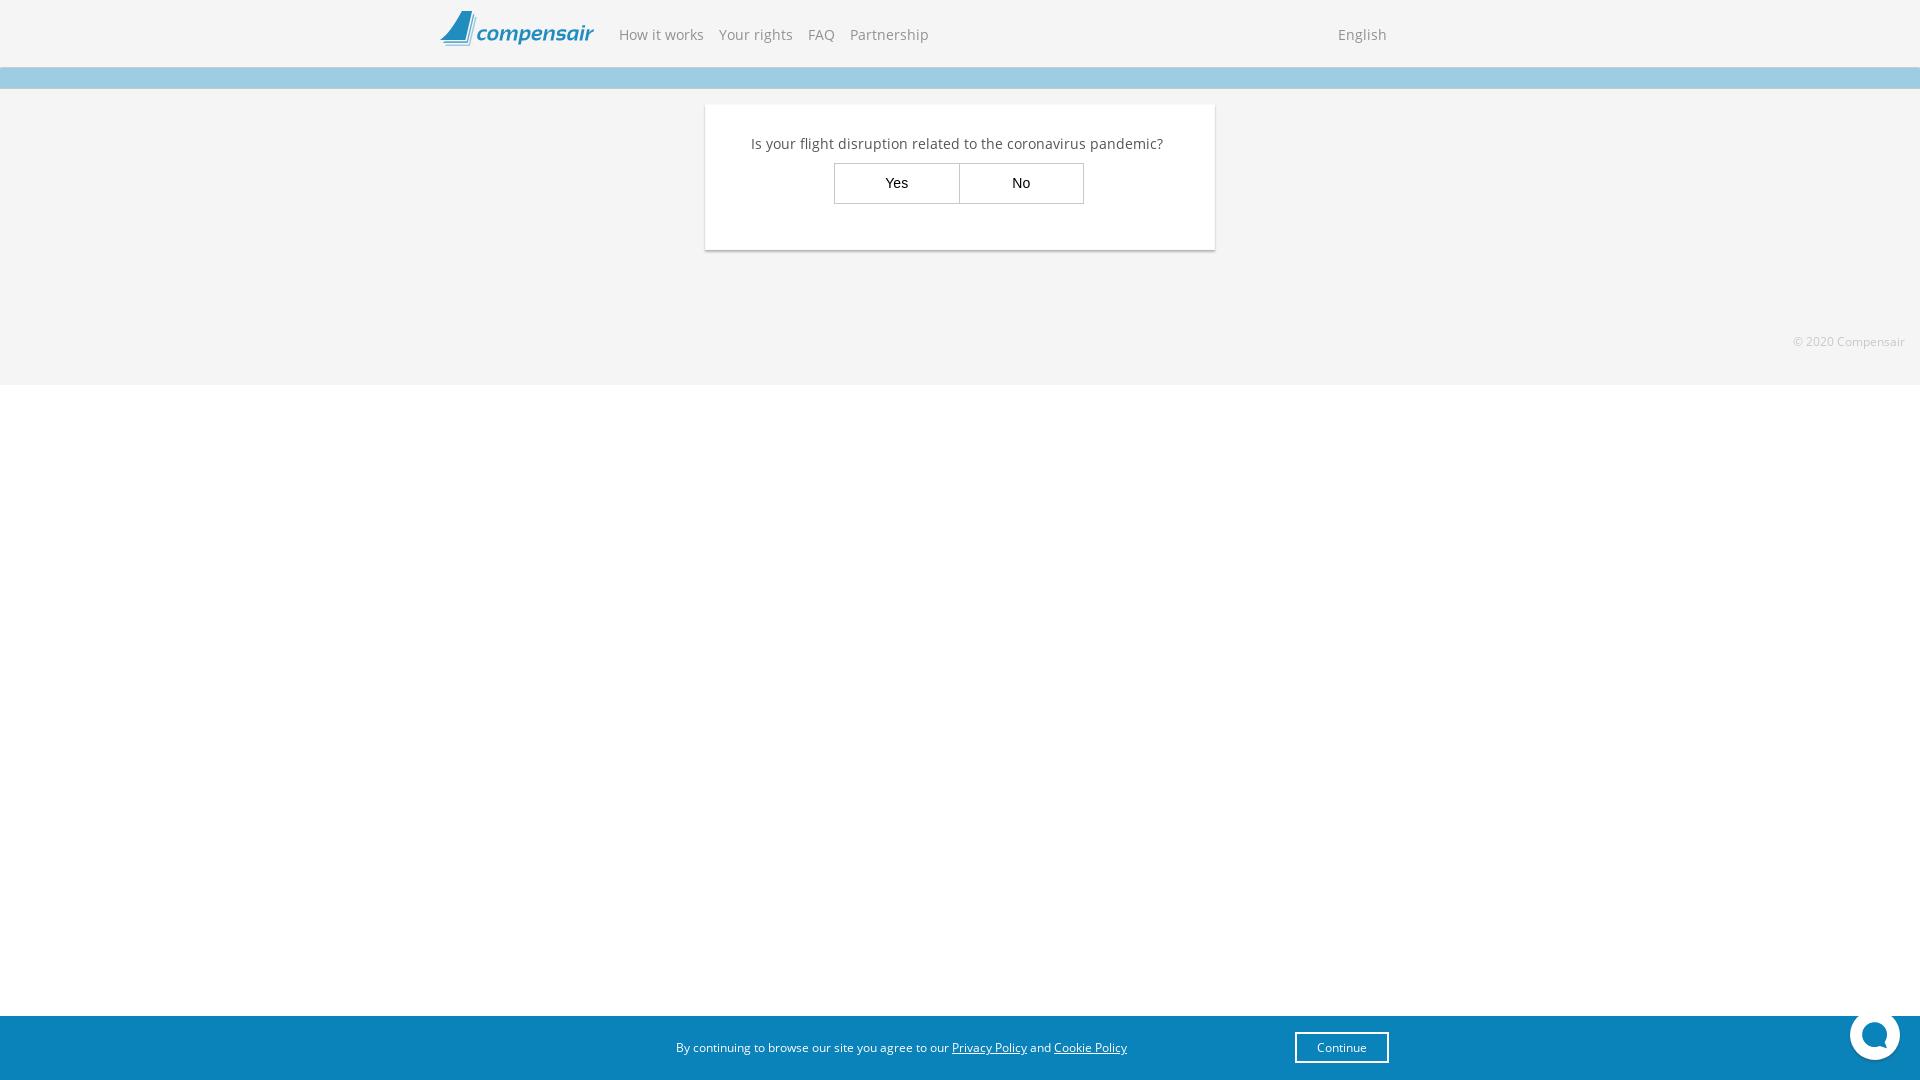 Compensair website